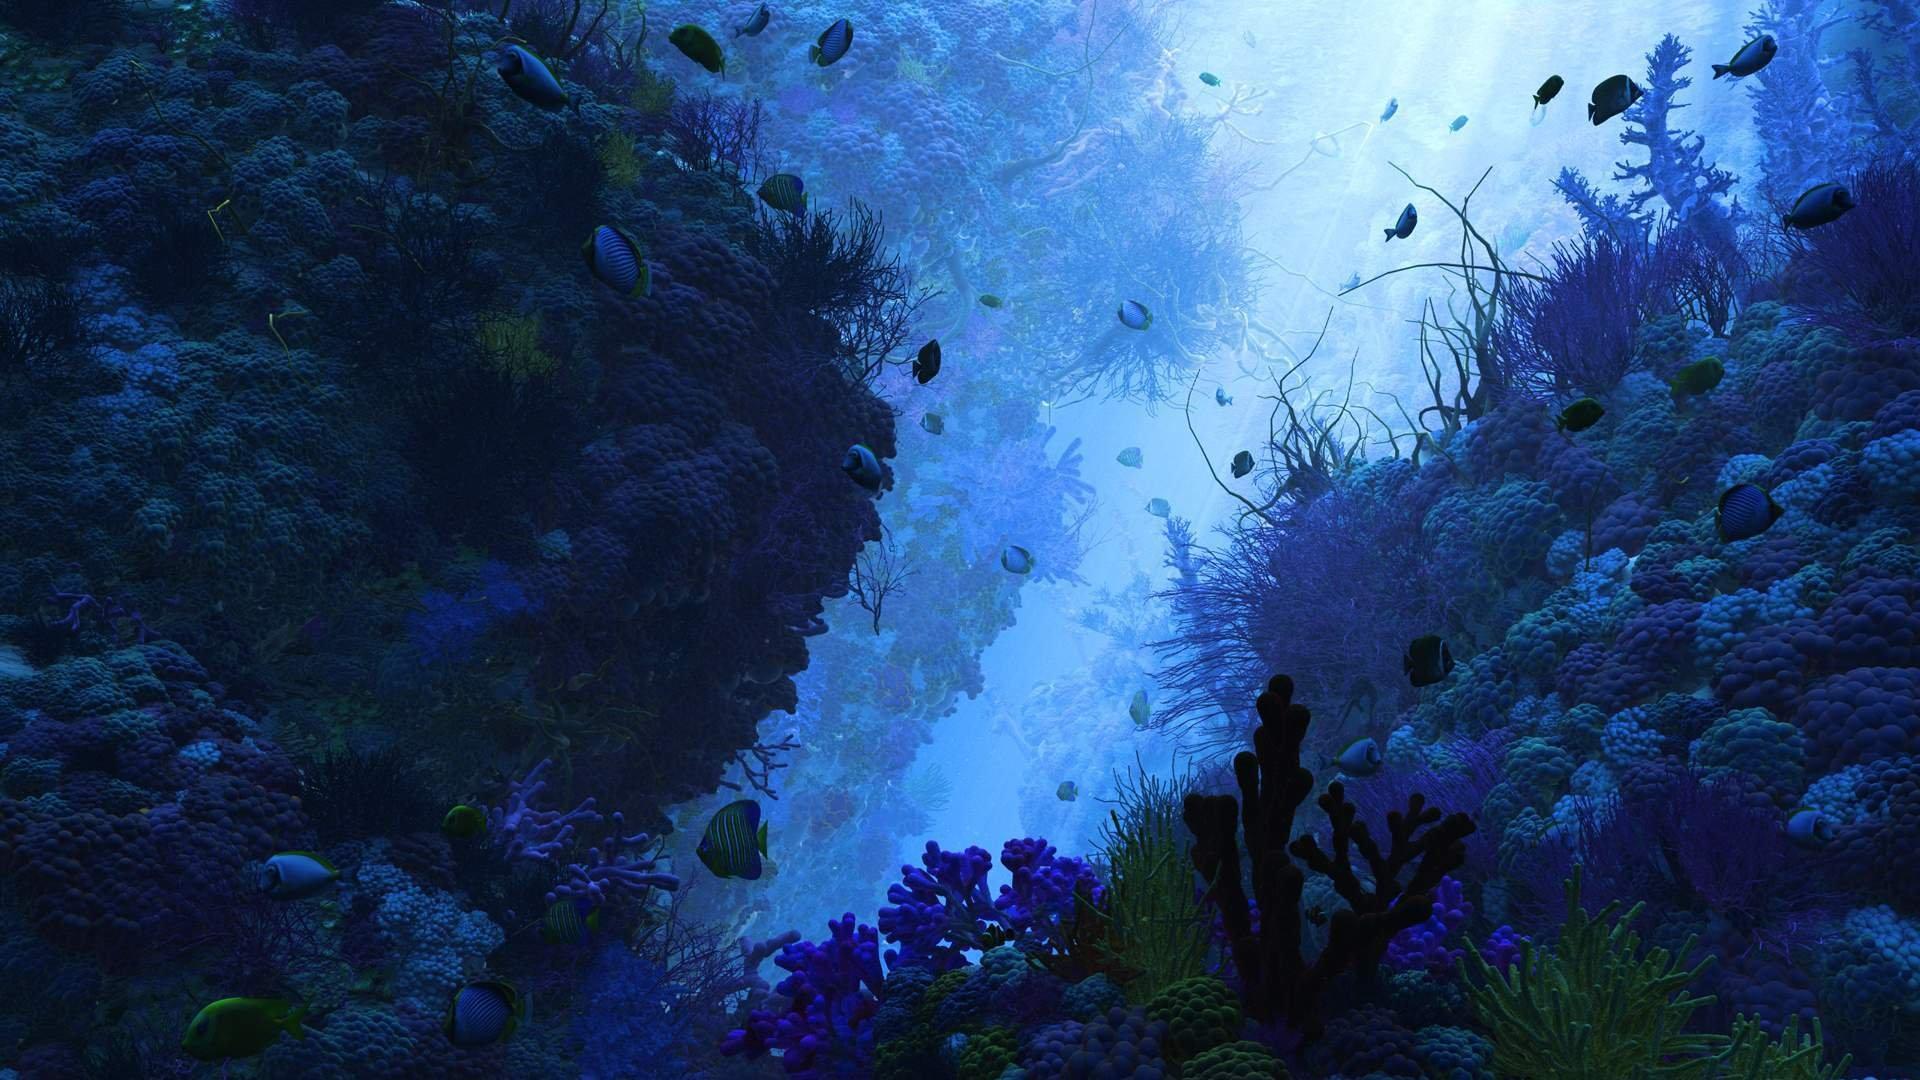 Фотообои на тему берег океана человек состоянии